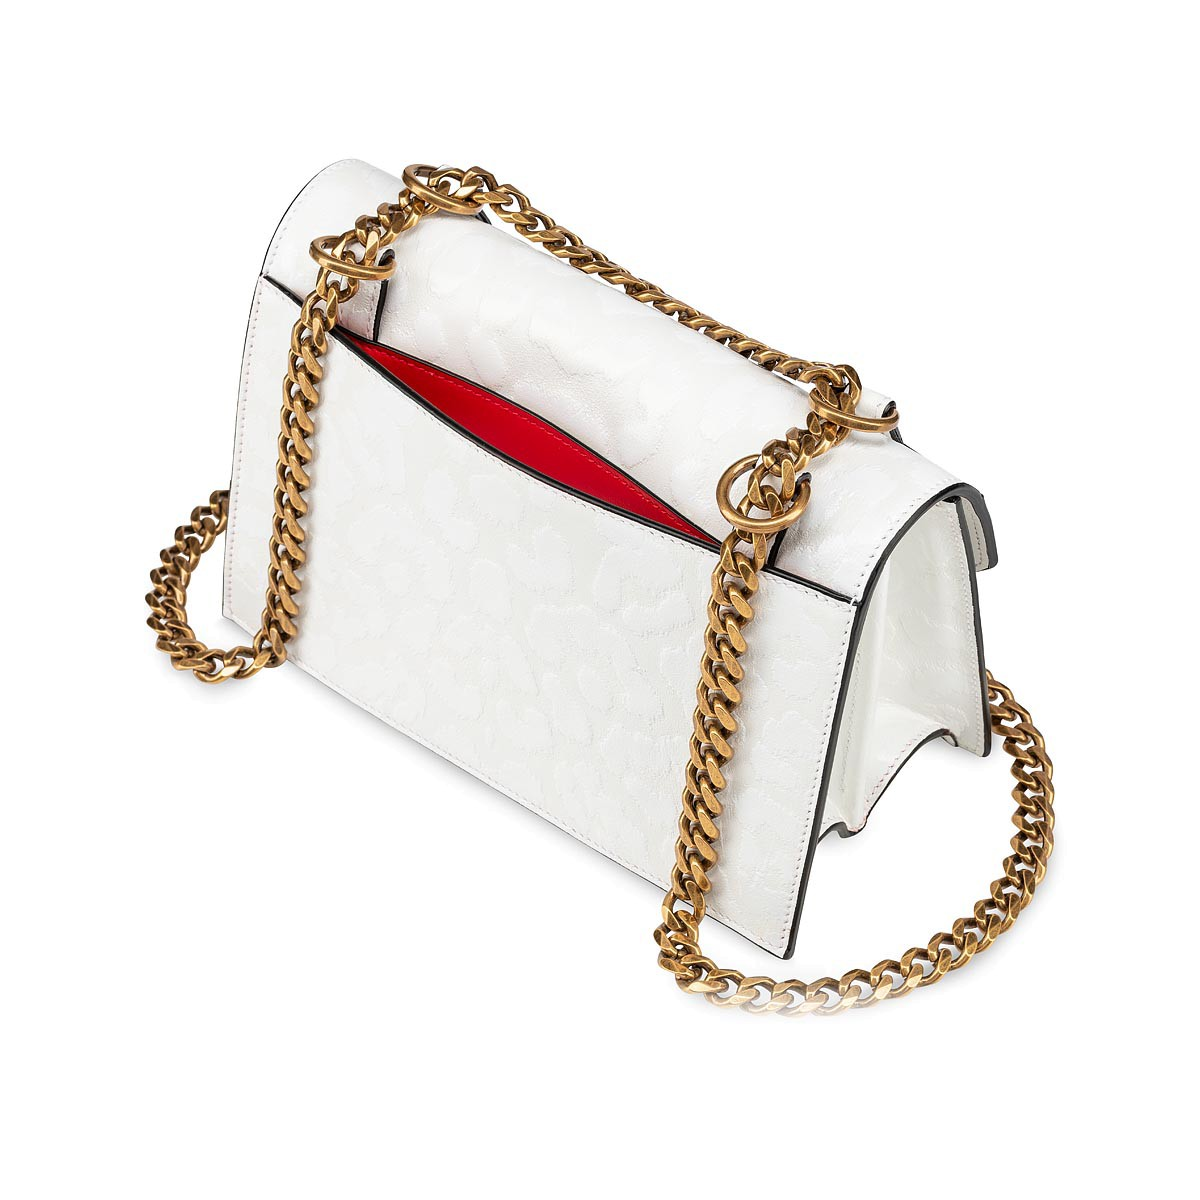 Bags - Elisa Mini - Christian Louboutin